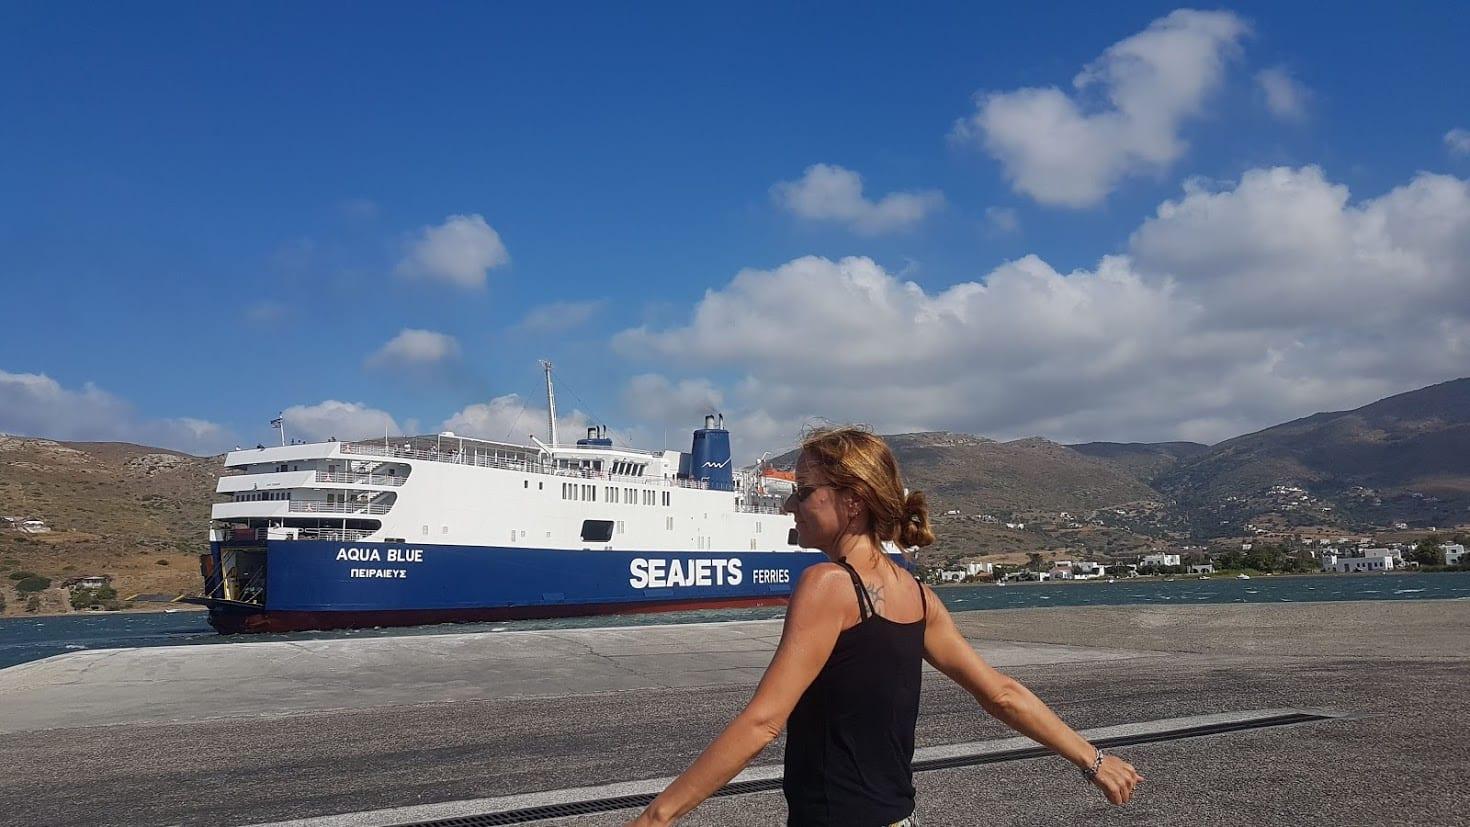 Seajets Aqua Blue Ferry